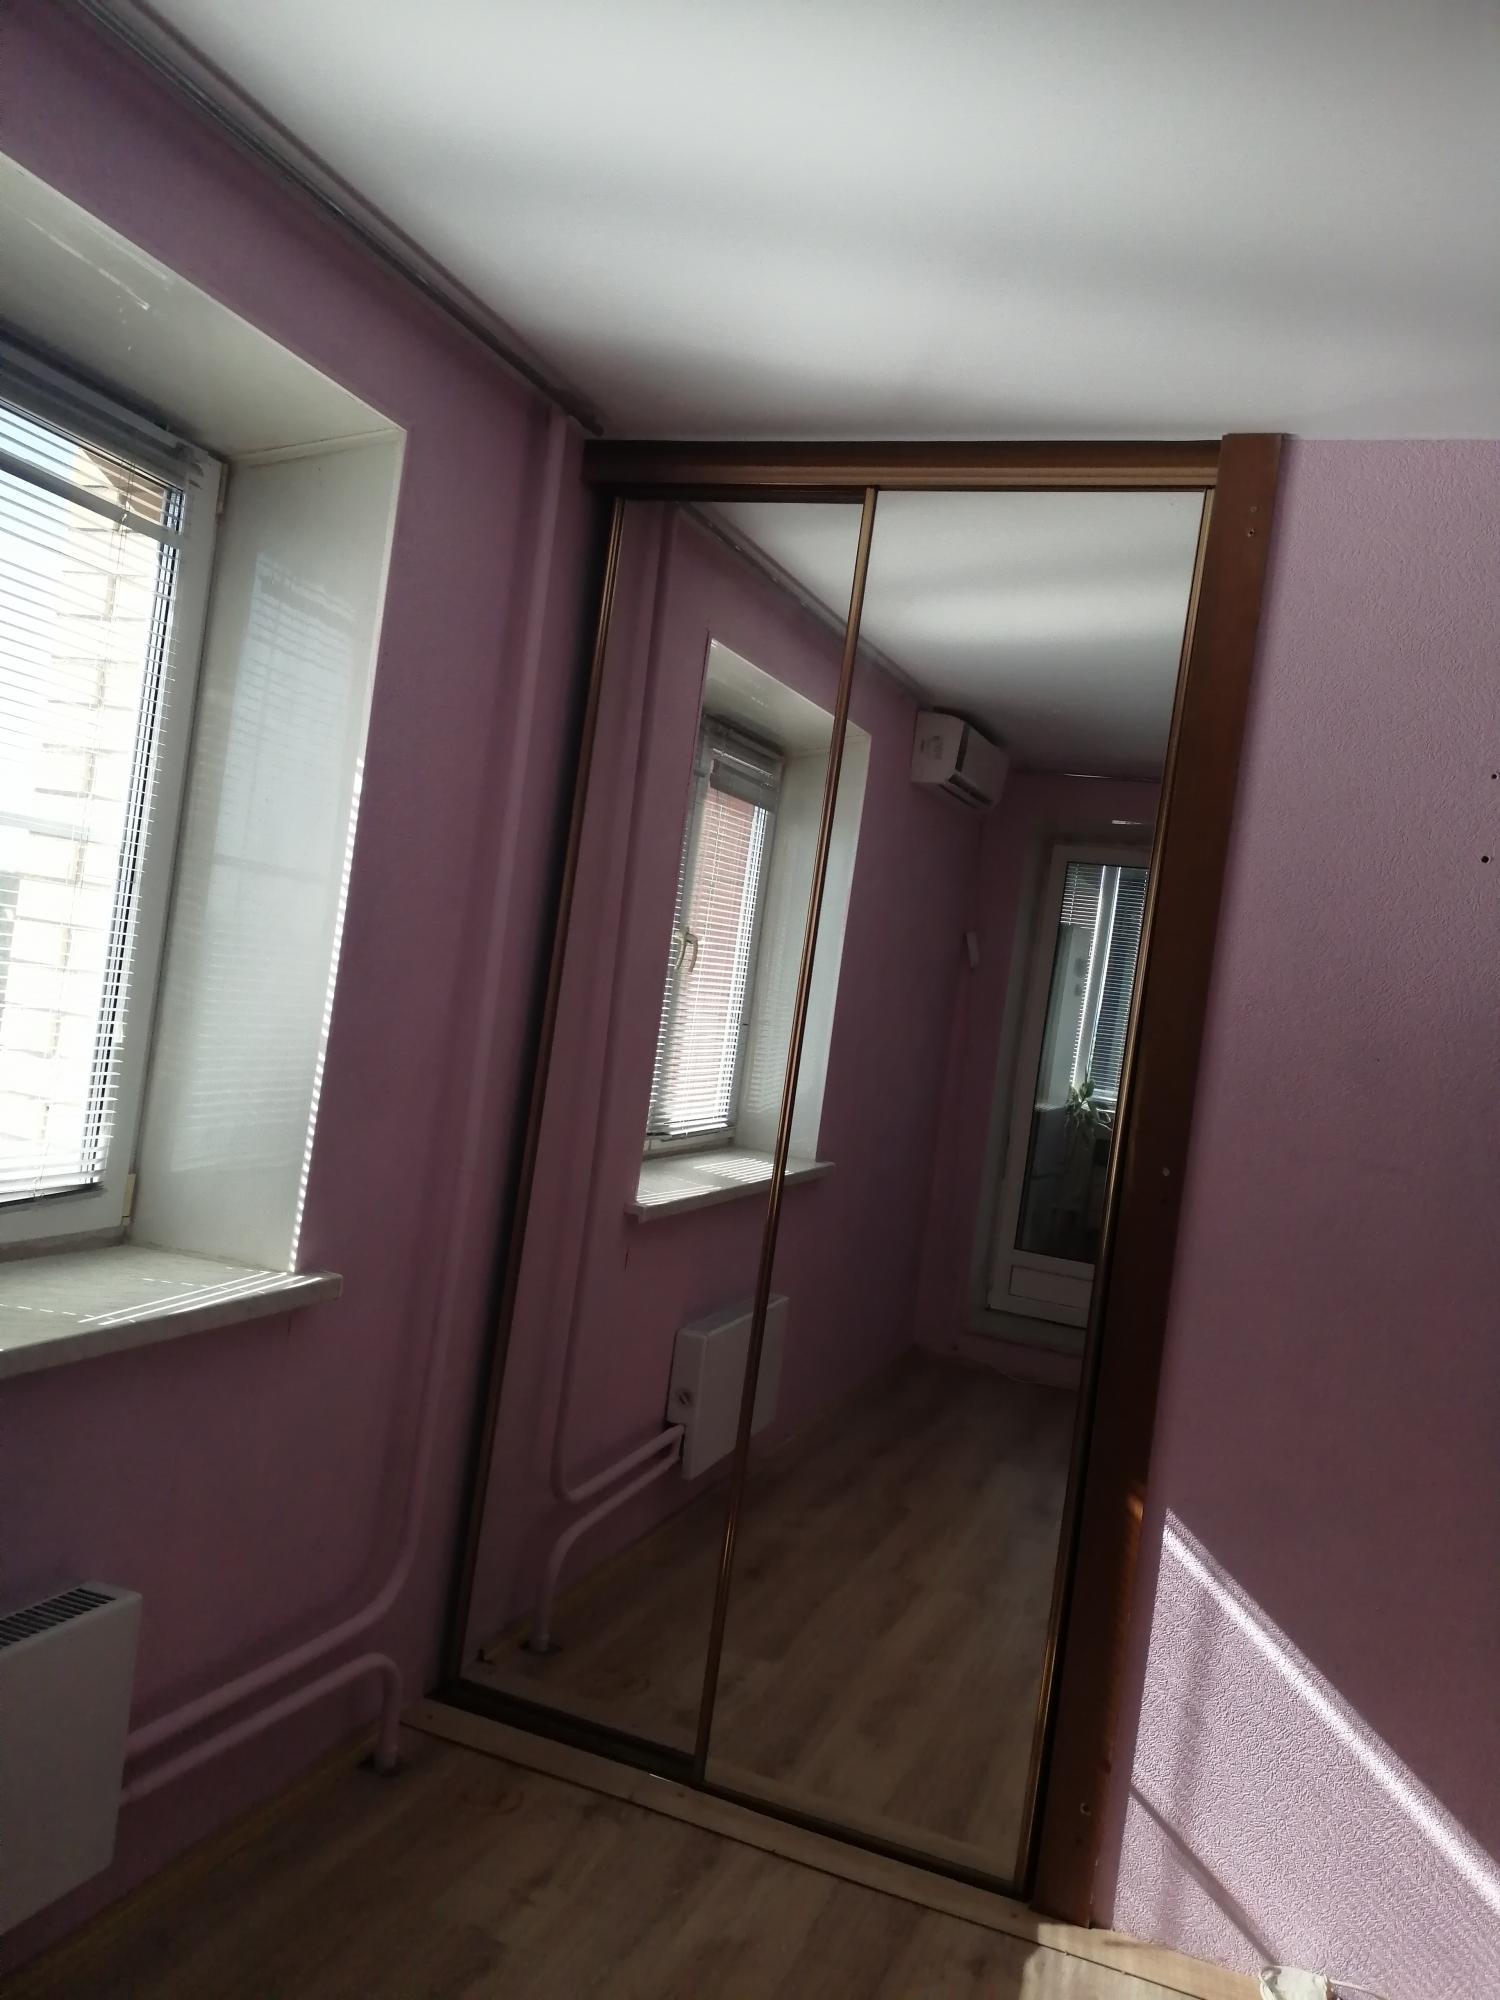 Apartment, 2 rooms, 60 m2 in Ivanteevka 89037472021 buy 4